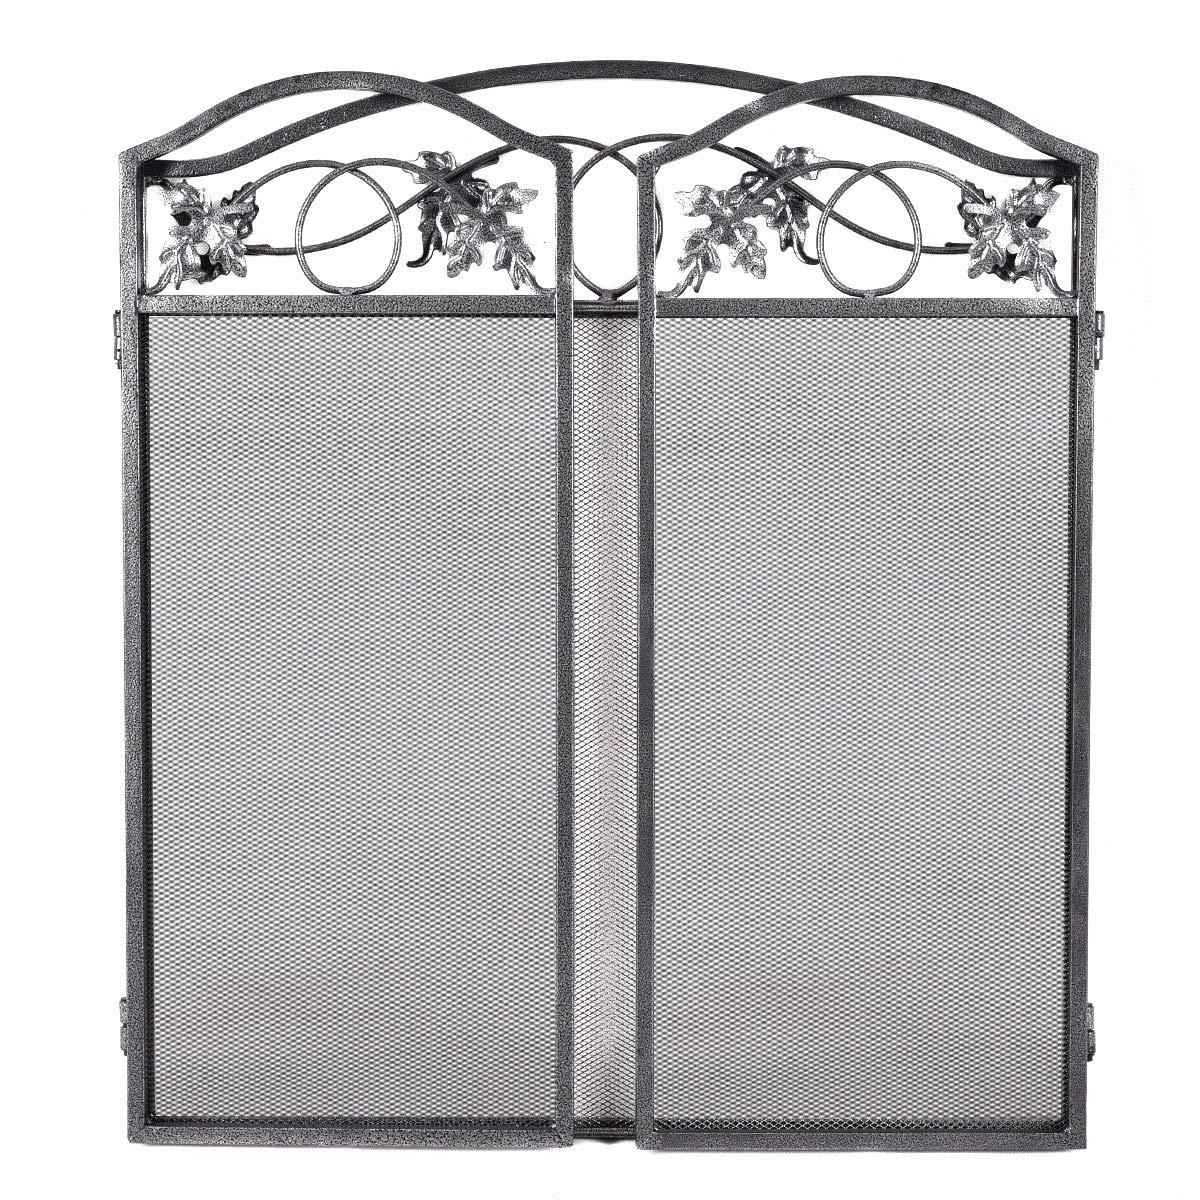 3 Panel Folding Steel Fireplace Screen Doors